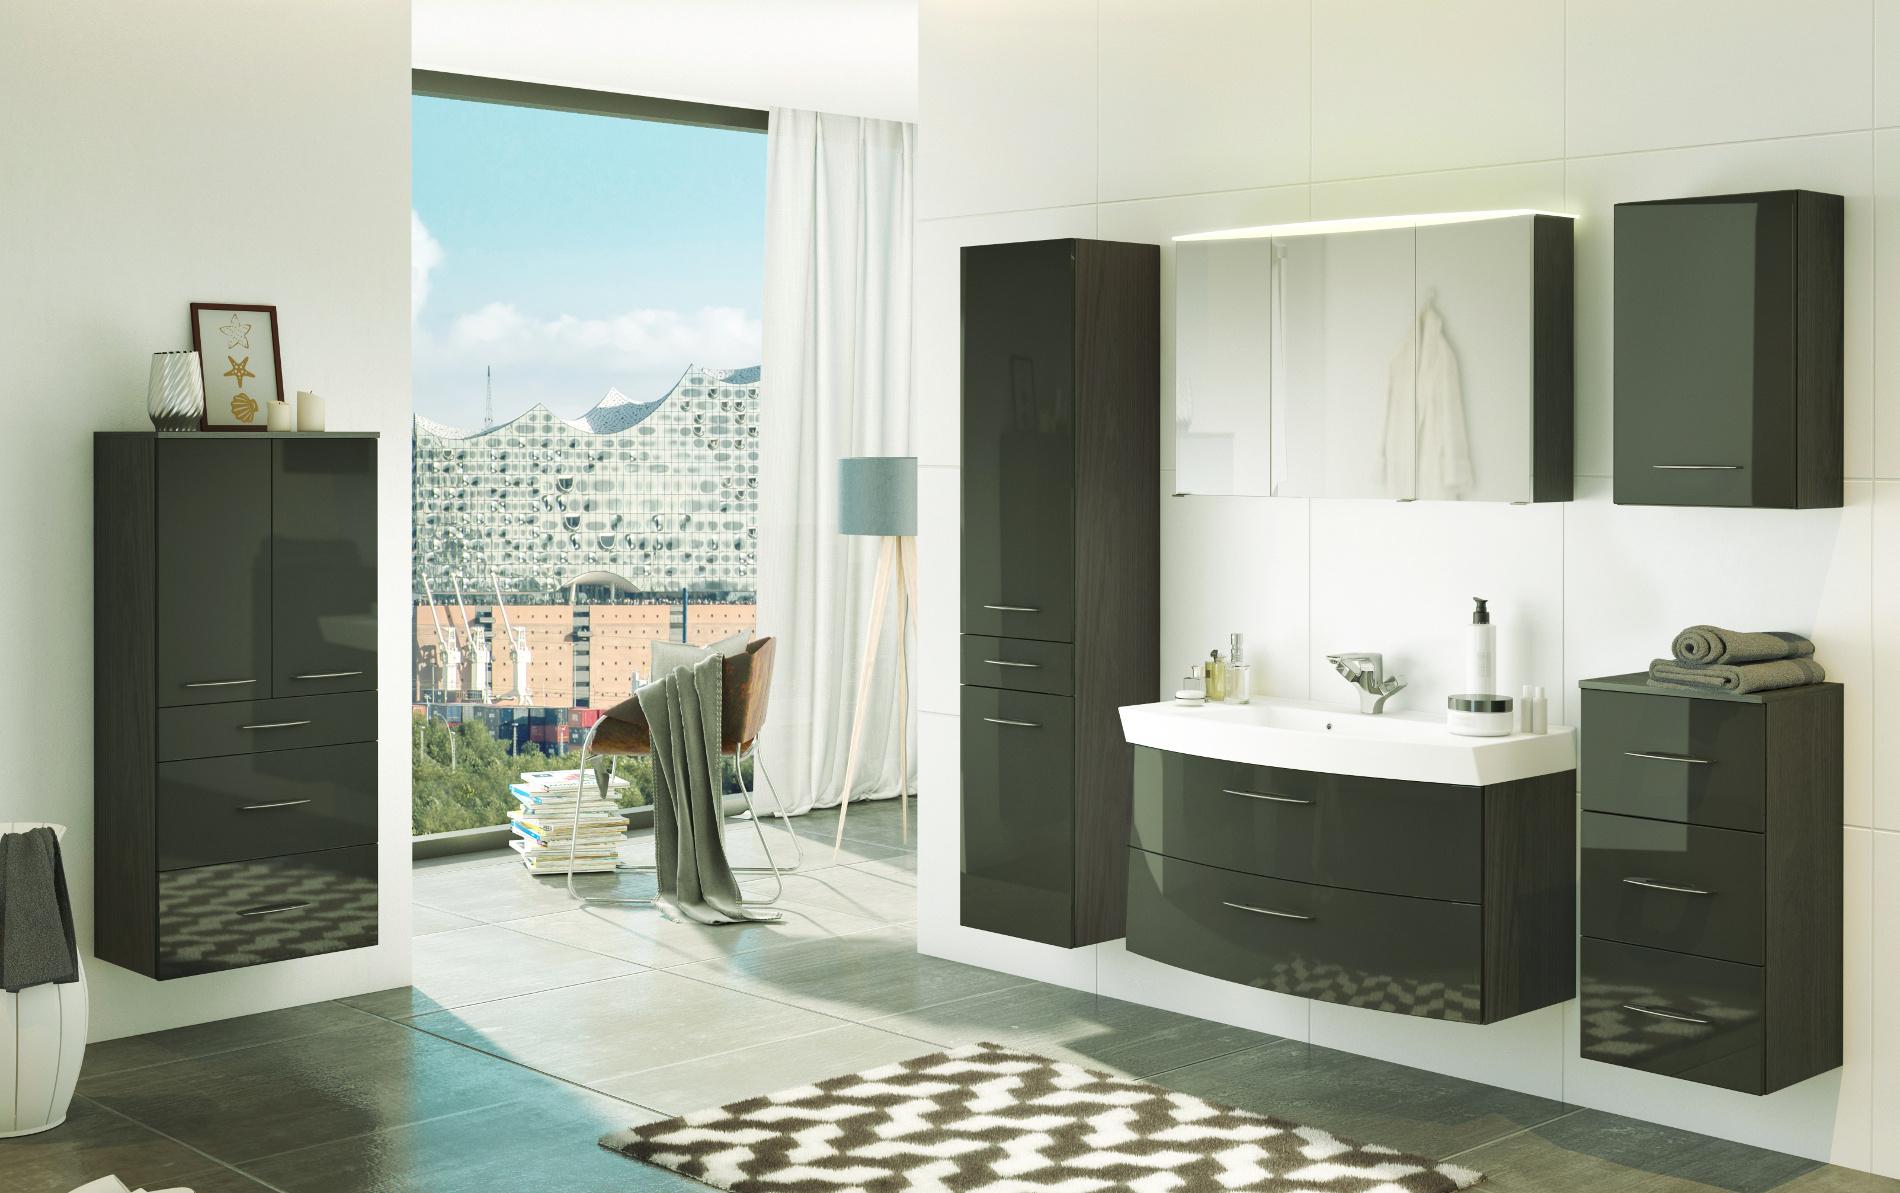 bad midischrank florida 2 t rig 65 cm breit hochglanz grau graphitgrau bad bad midischr nke. Black Bedroom Furniture Sets. Home Design Ideas